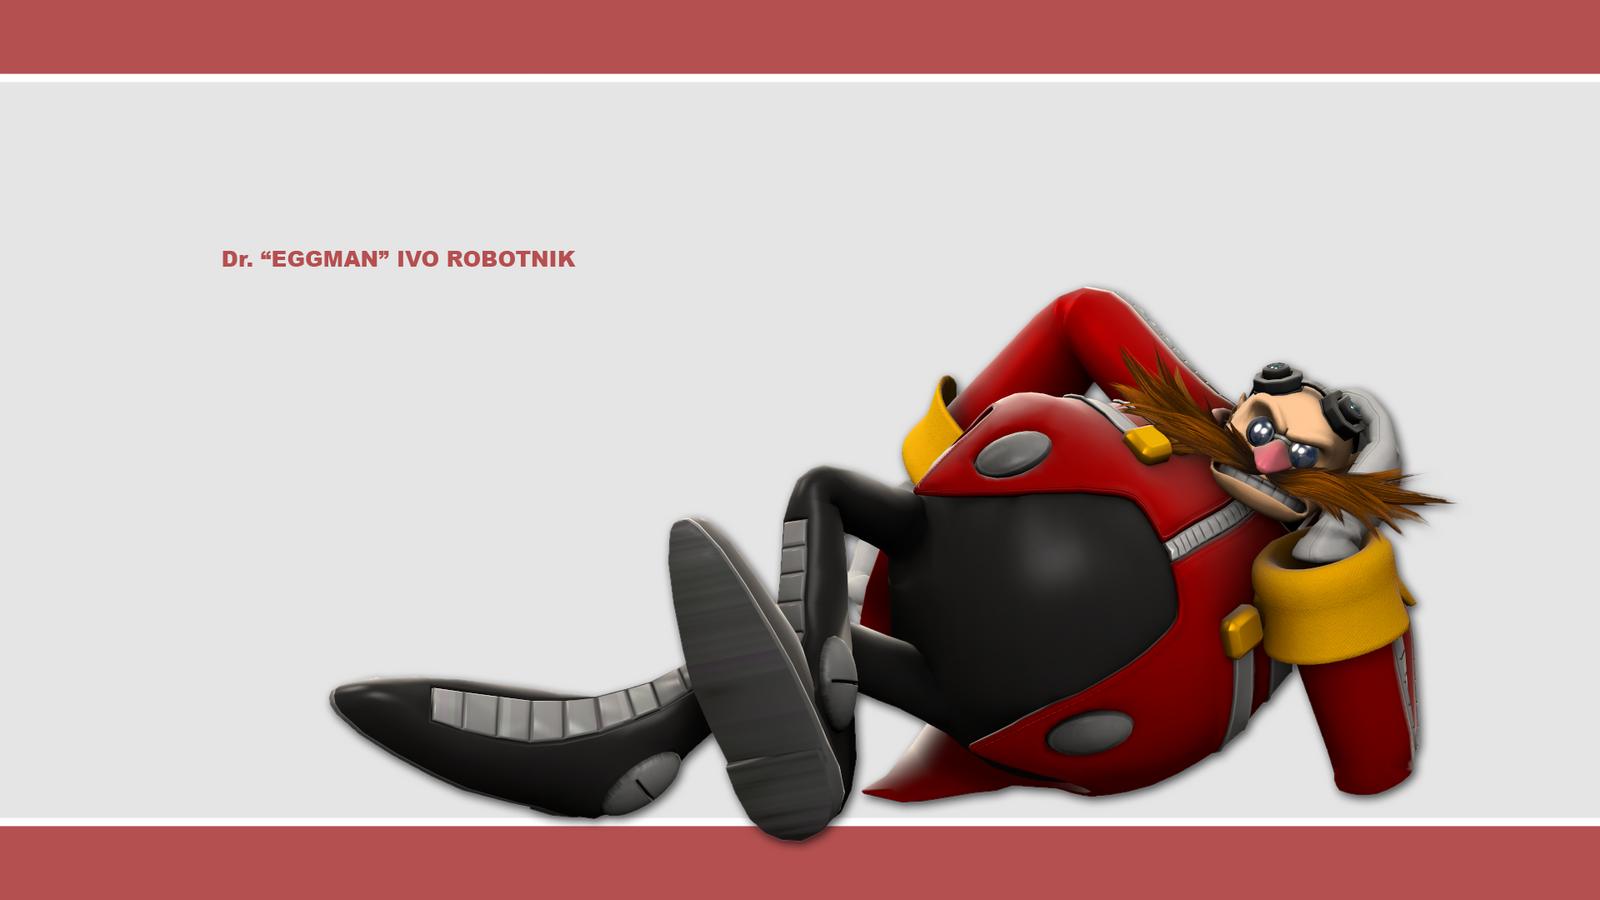 Sonic Channel Wallpaper 2011: Eggman by Lucas-da-Hedgehog